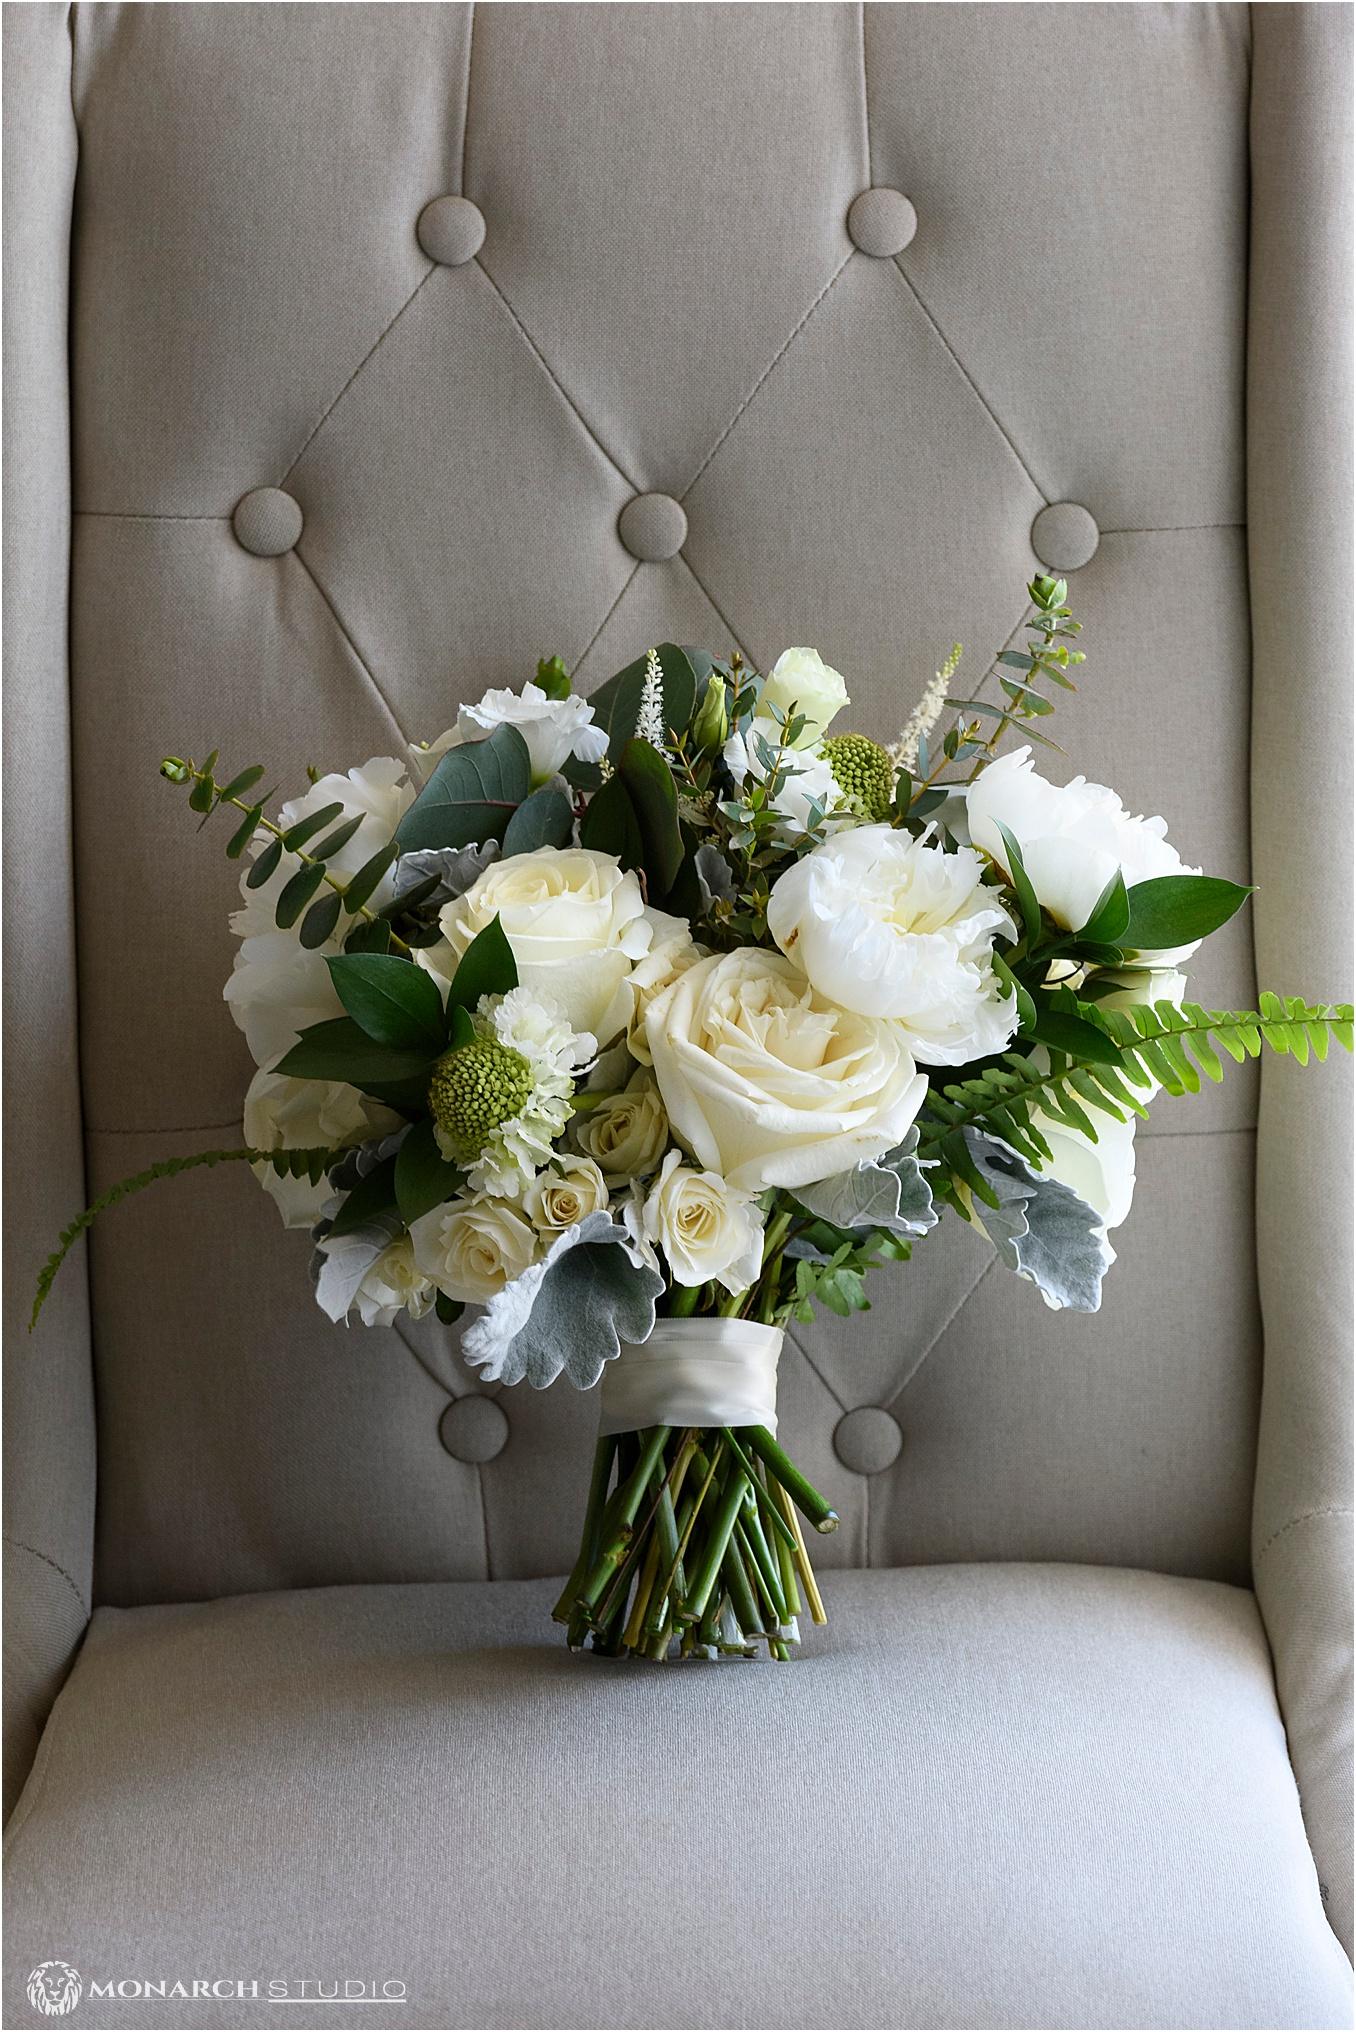 025-whiteroom-wedding-photographer-2019-05-22_0007.jpg